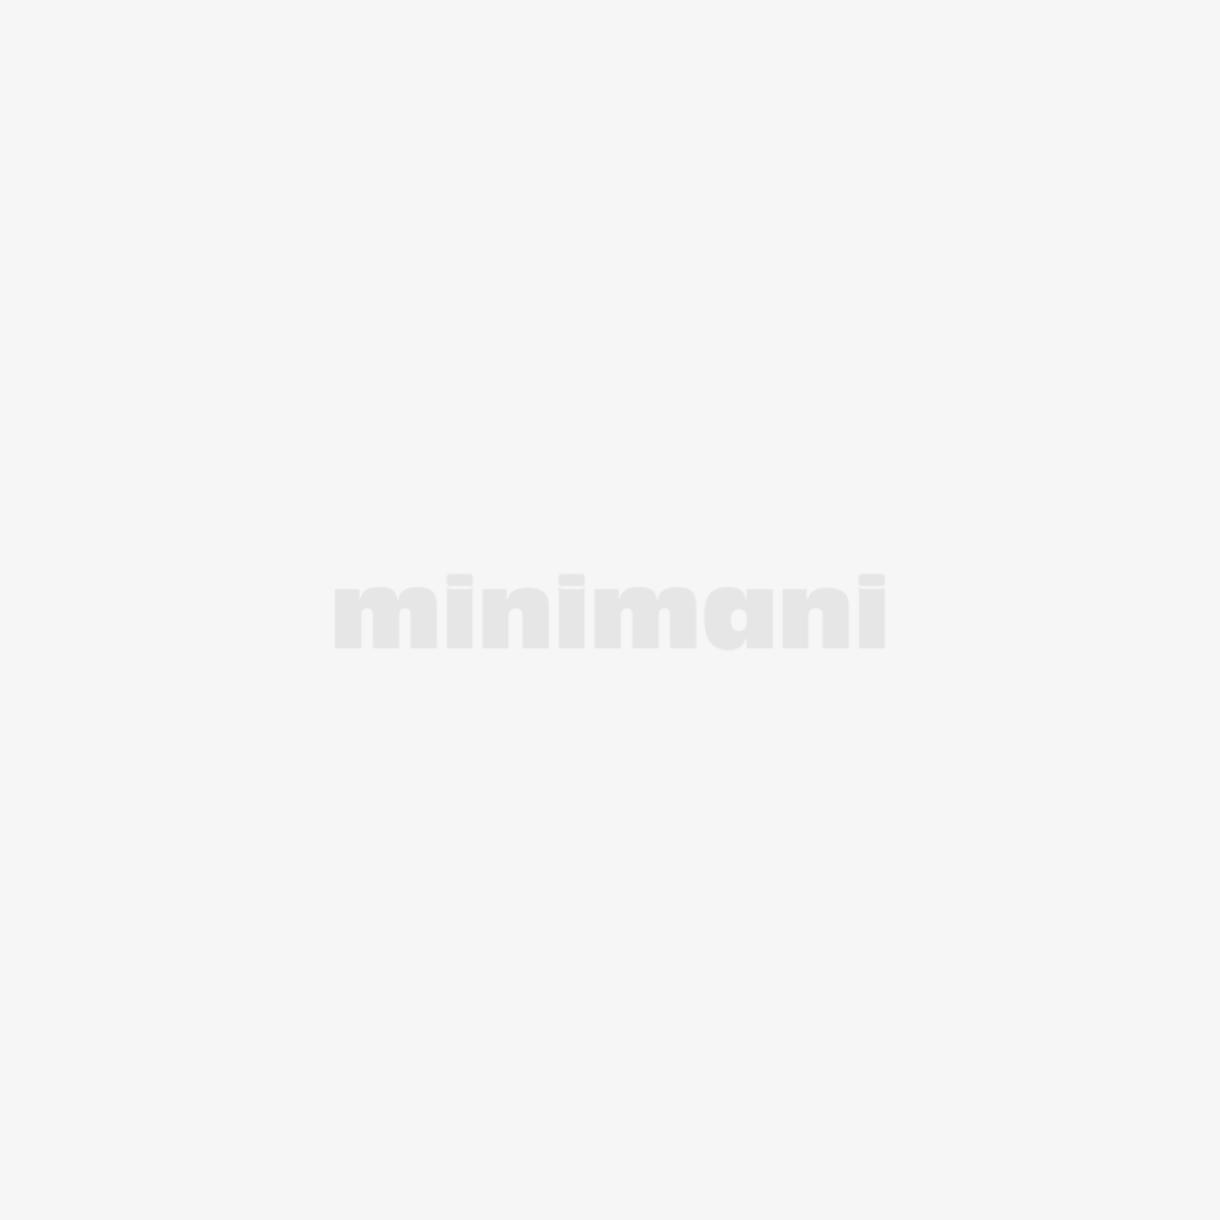 METALTEX FLORENZ KULMAHYLLY 3-OS 25X25X51 CM